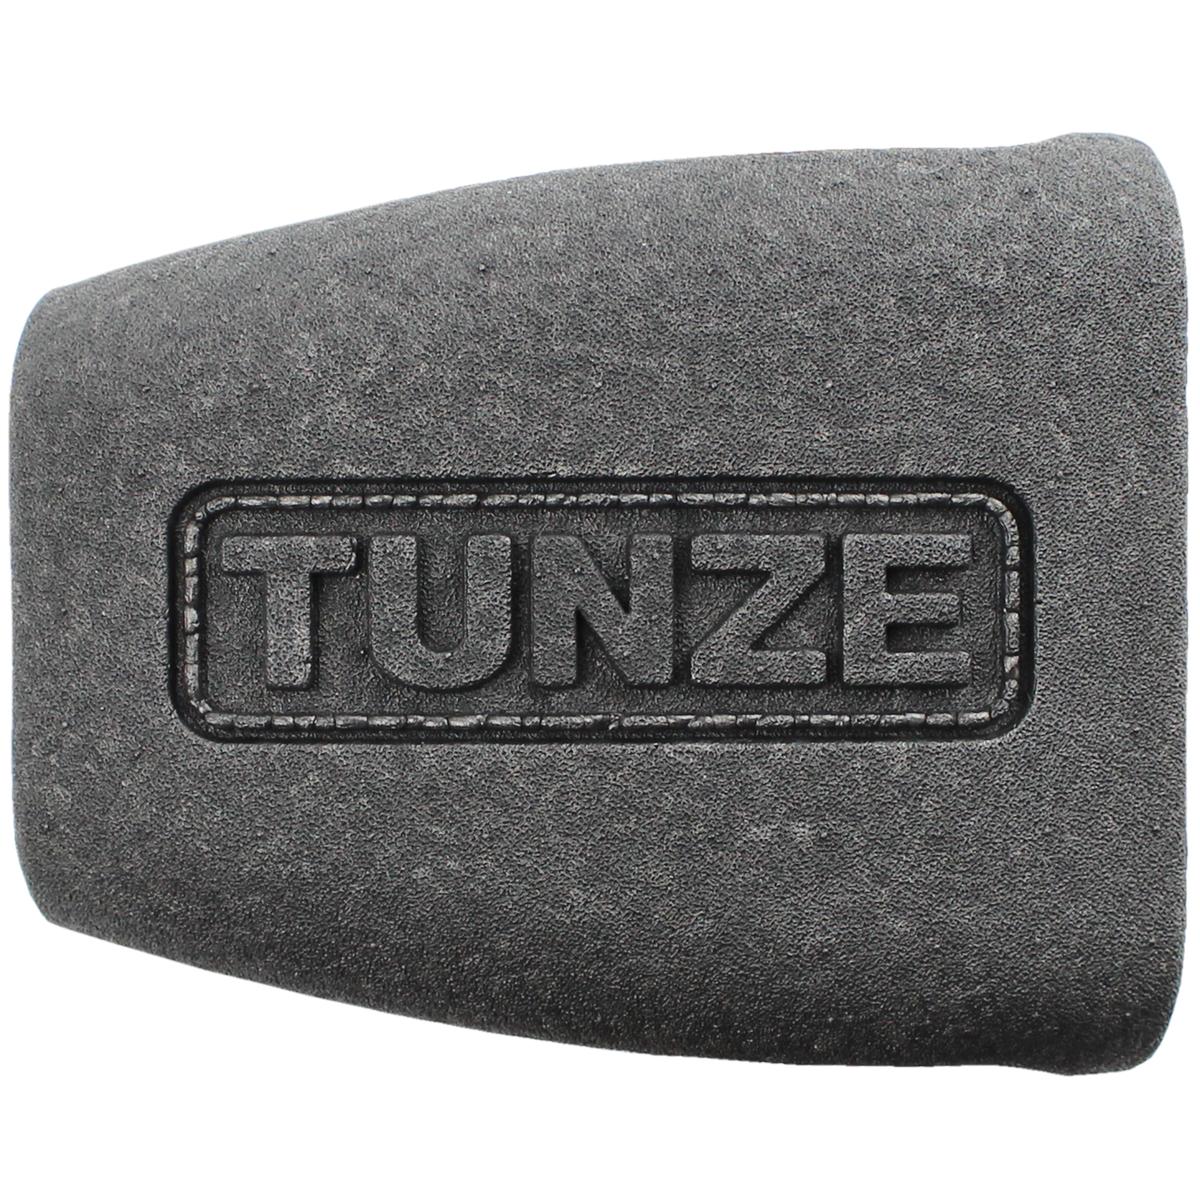 Tunze Care Booster by Tunze]